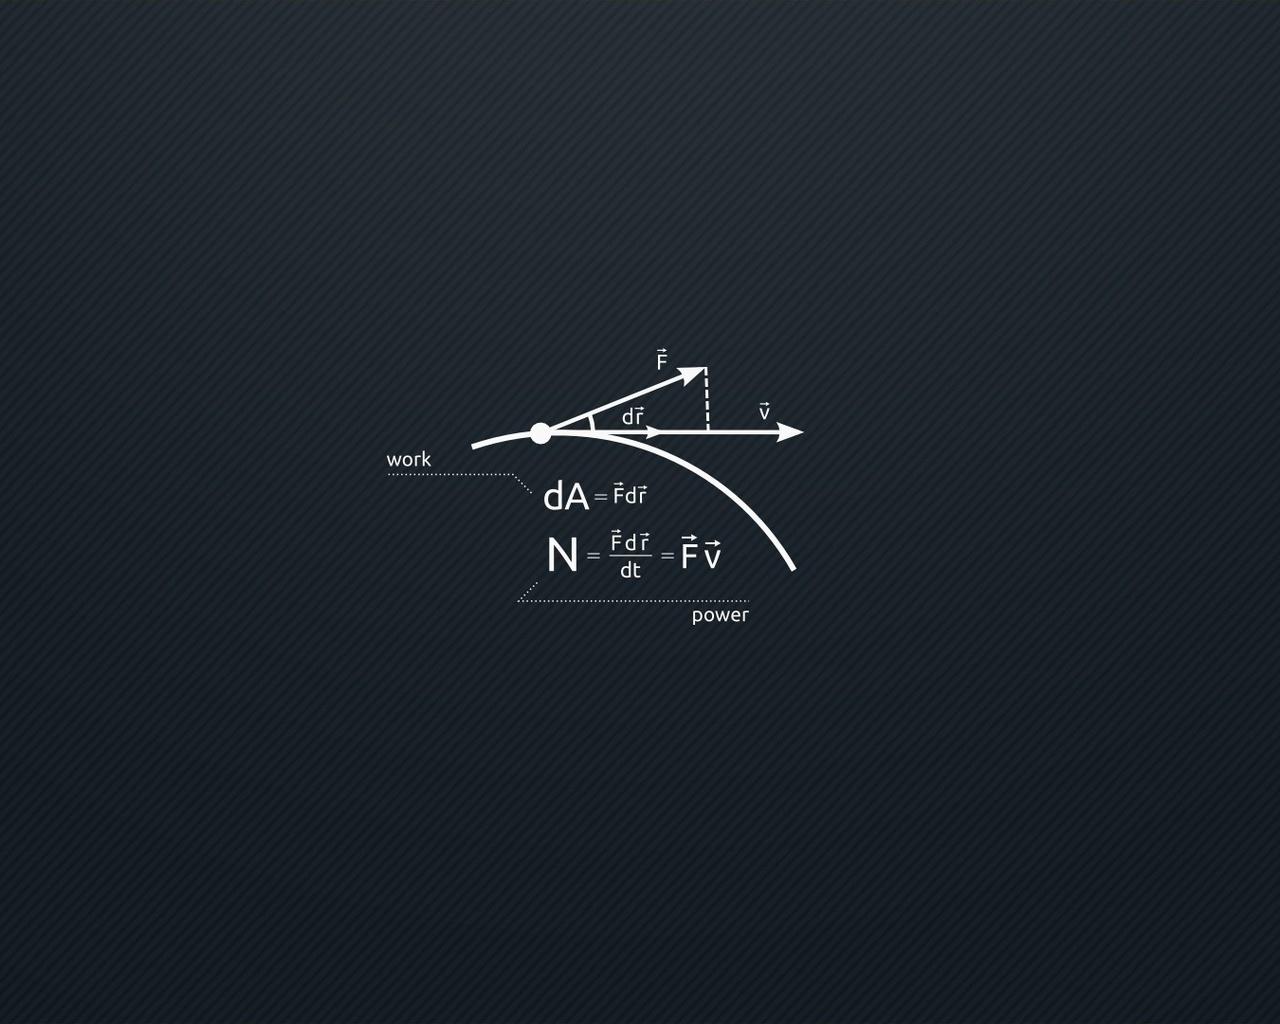 Wallpaper physics work power Minimalism widescreen 1280x1024 on 1280x1024